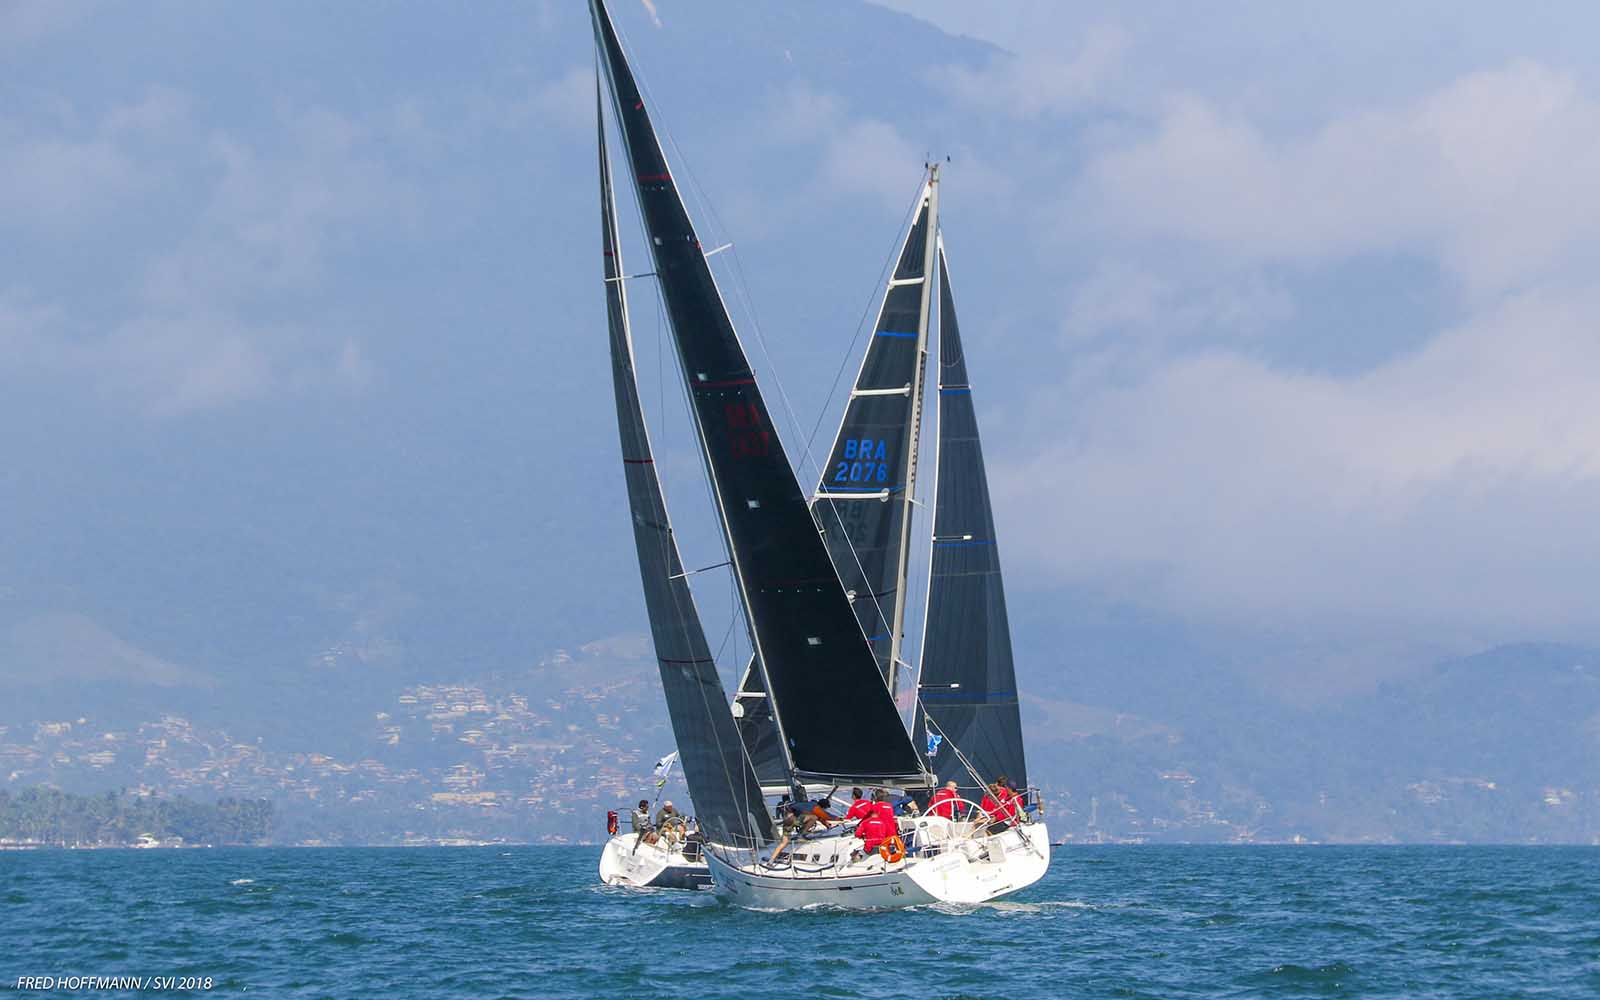 san chico 3 Semana Internacional de Vela de Ilhabela - boat shopping